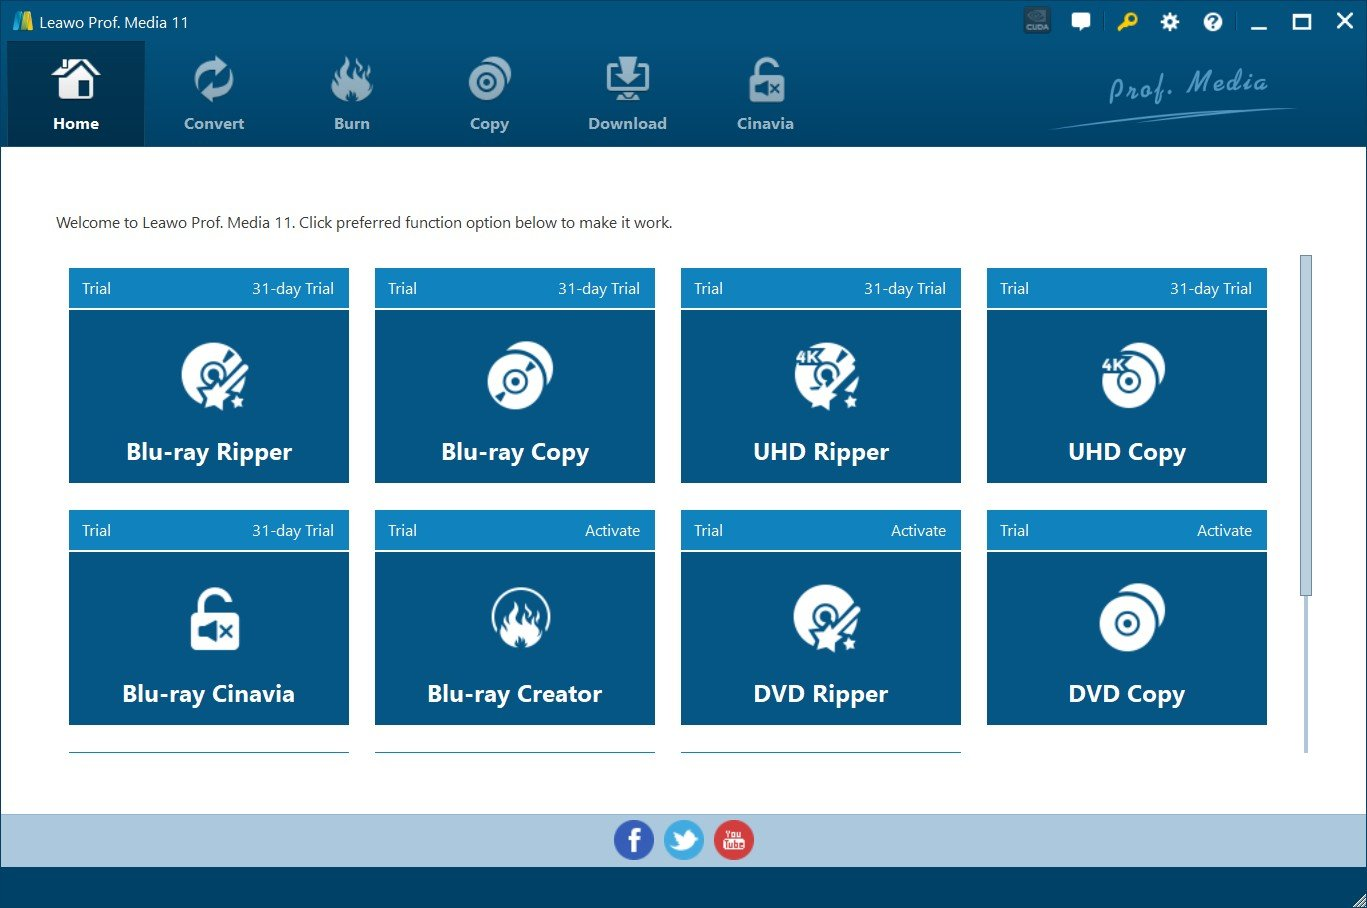 4K Blu-ray Burner Software Leawo Prof. Media